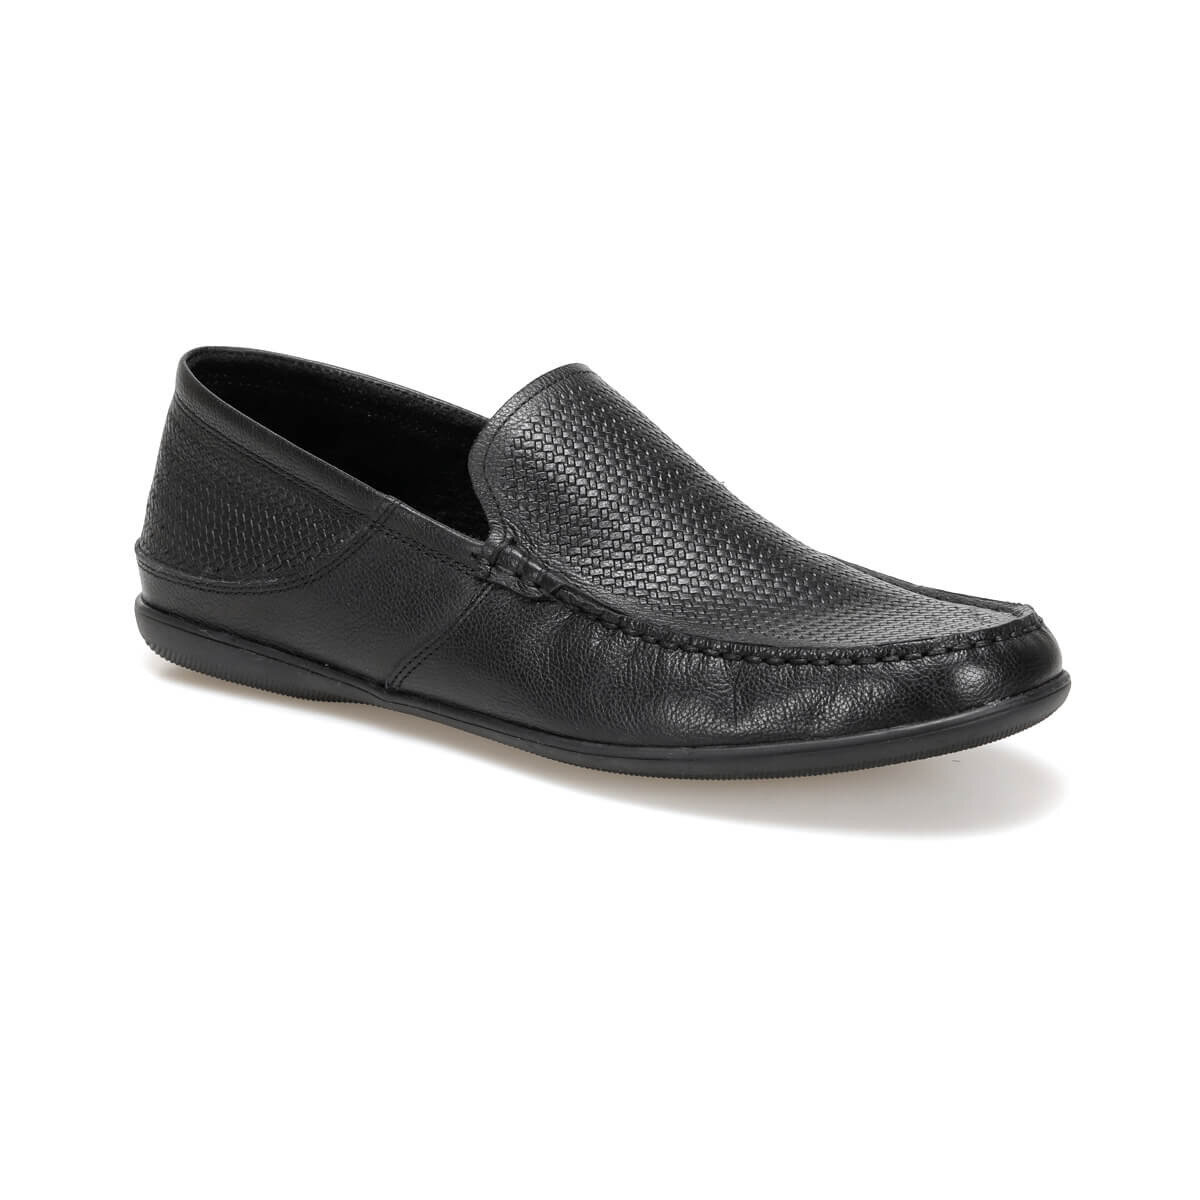 FLO GZL-50-1 Black Male Shoes Flogart